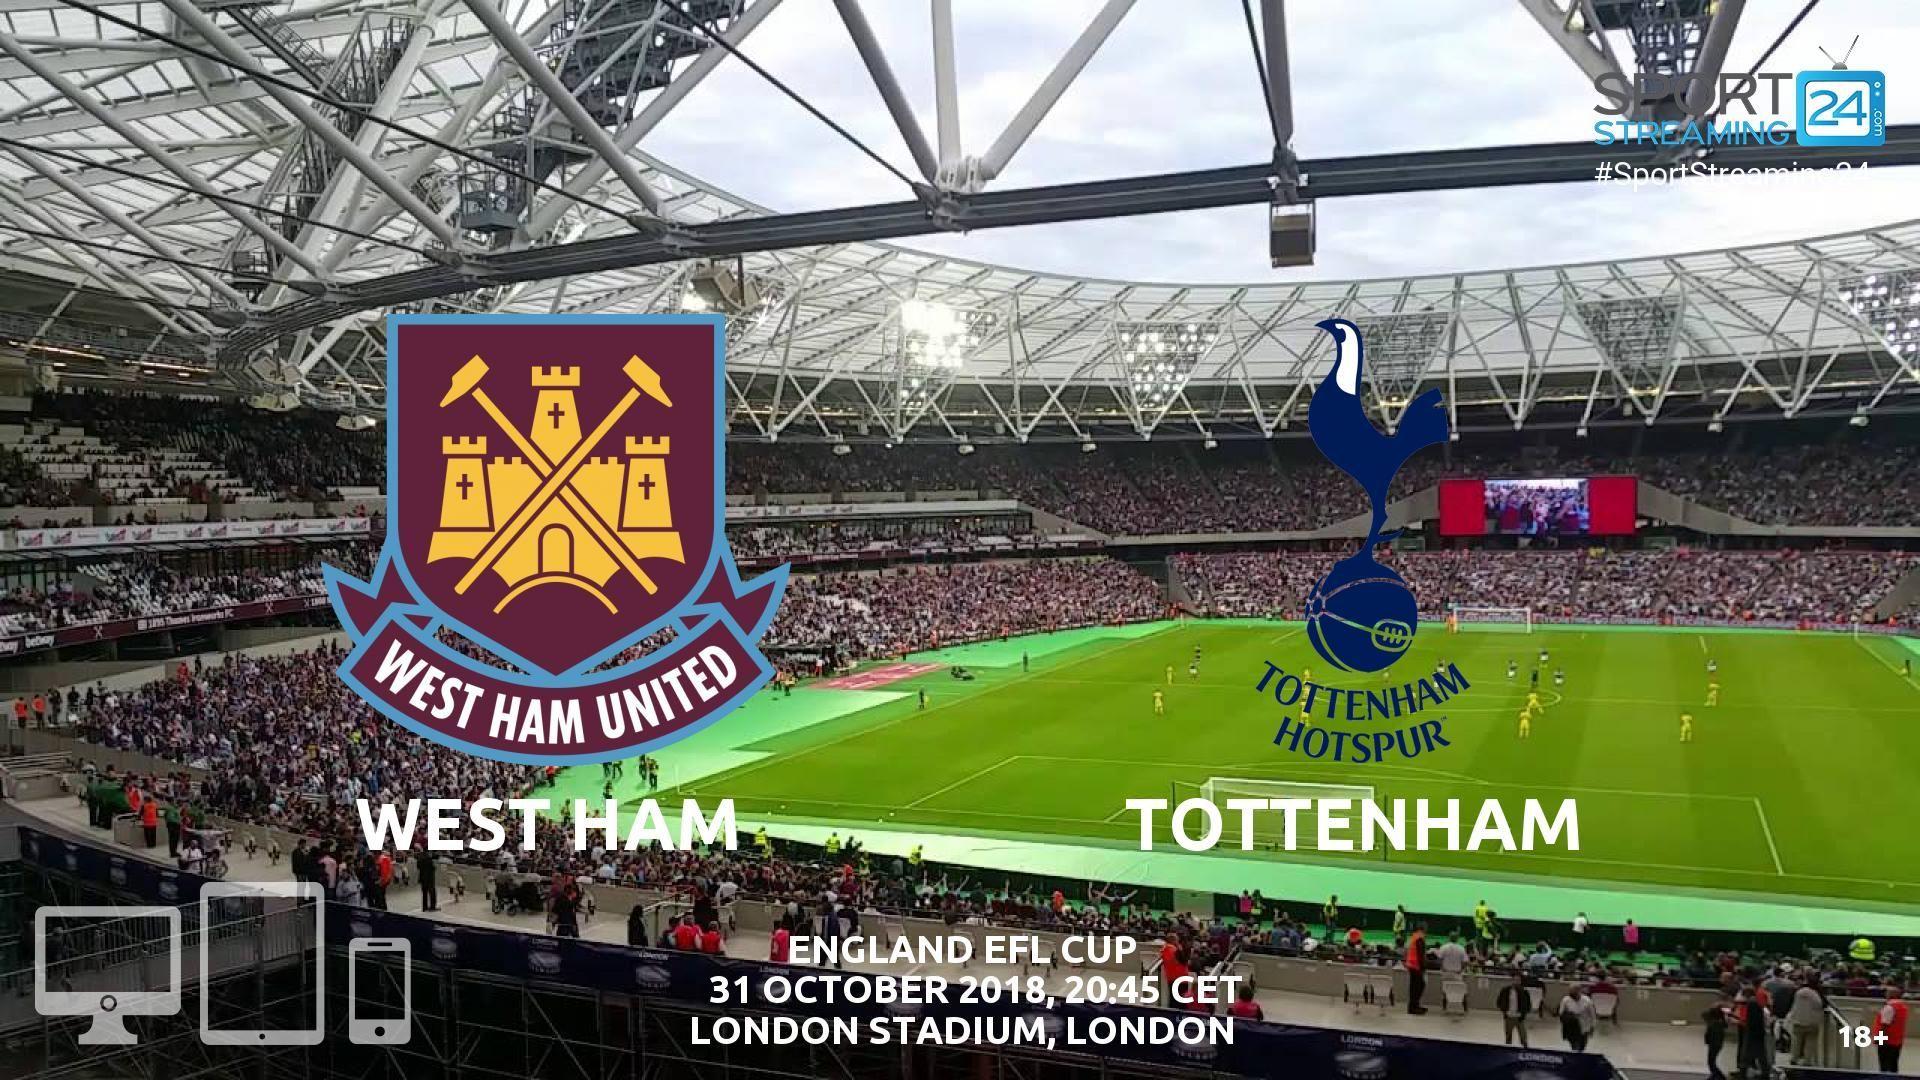 West Ham v Tottenham Live Streaming Football Tottenham